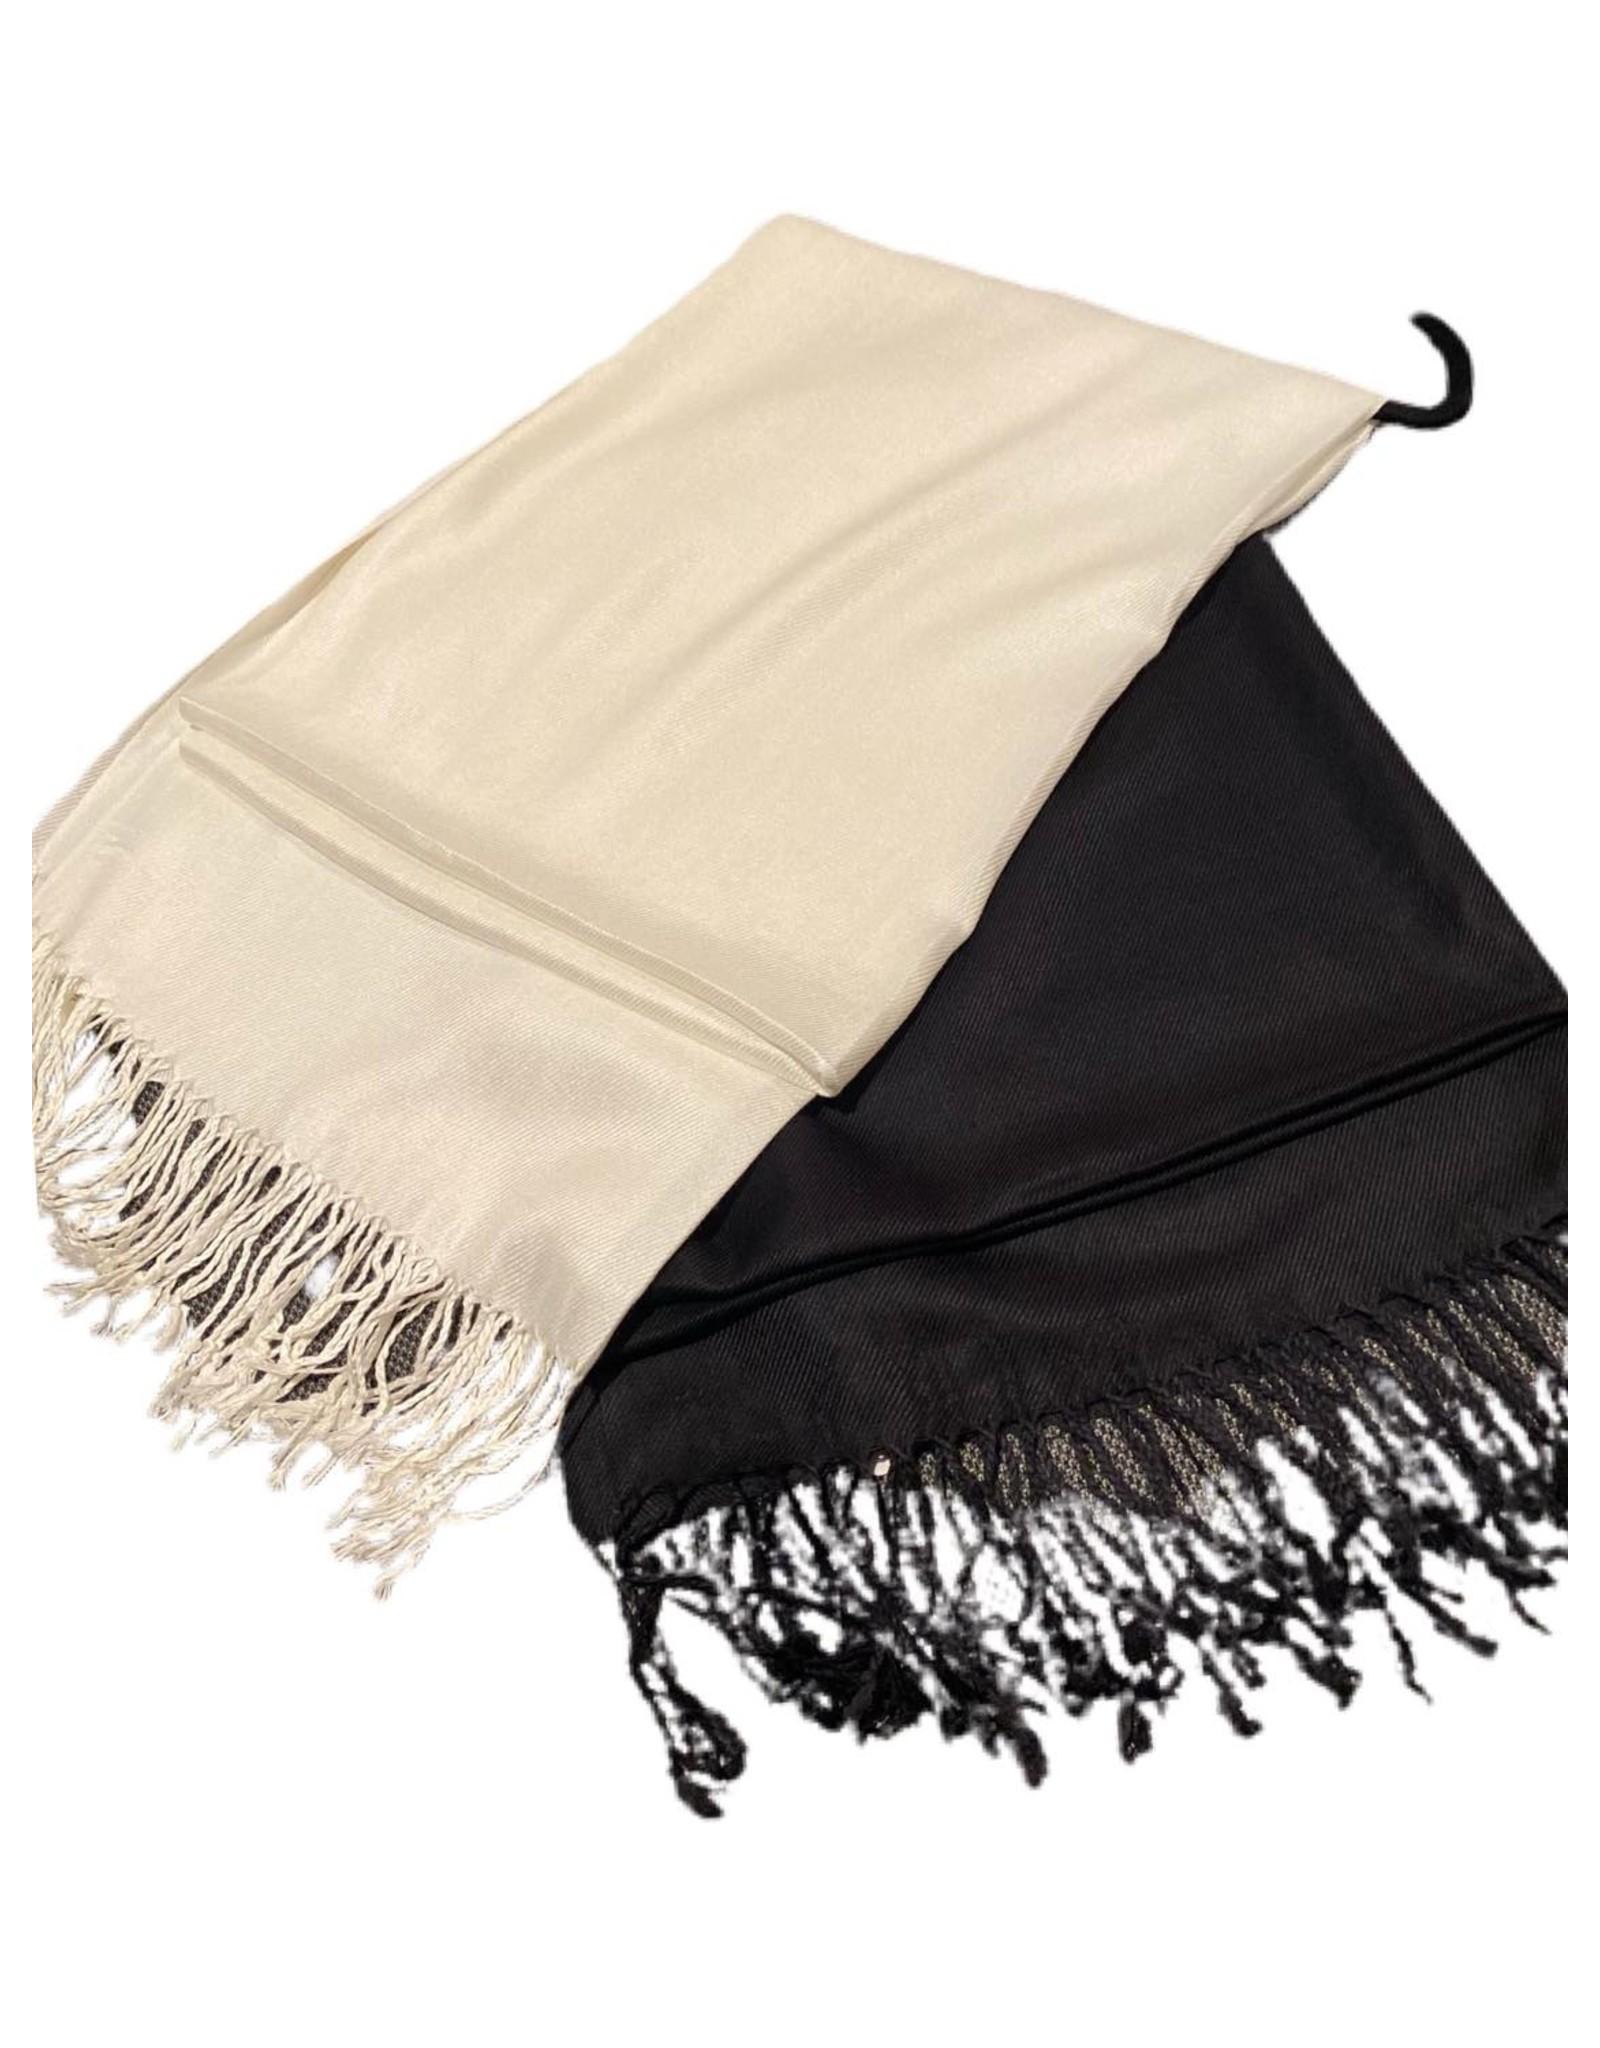 Pashmina - Black or White